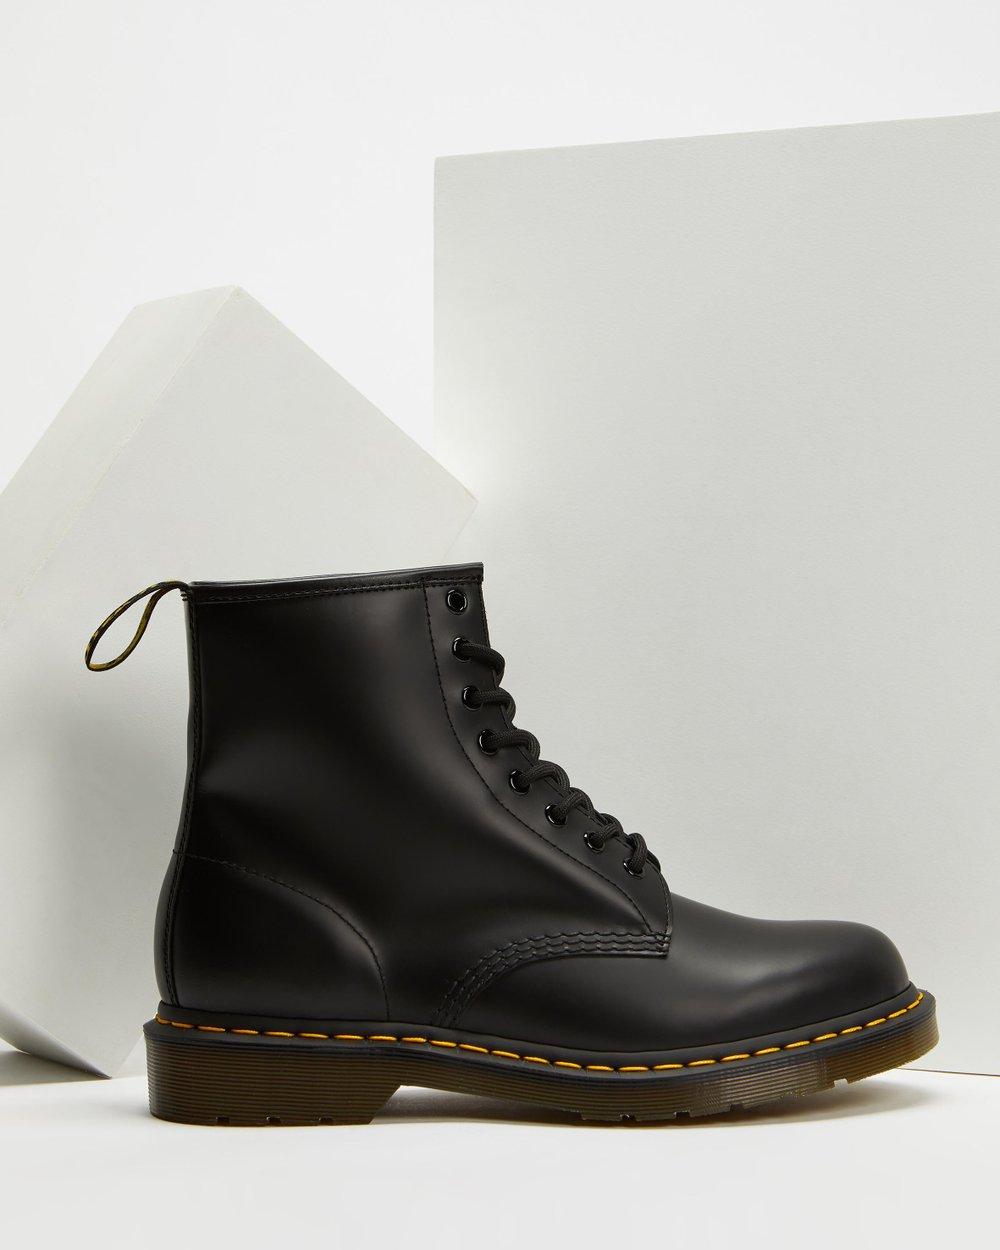 113406a46e 1460 8-Eye Boots - Unisex